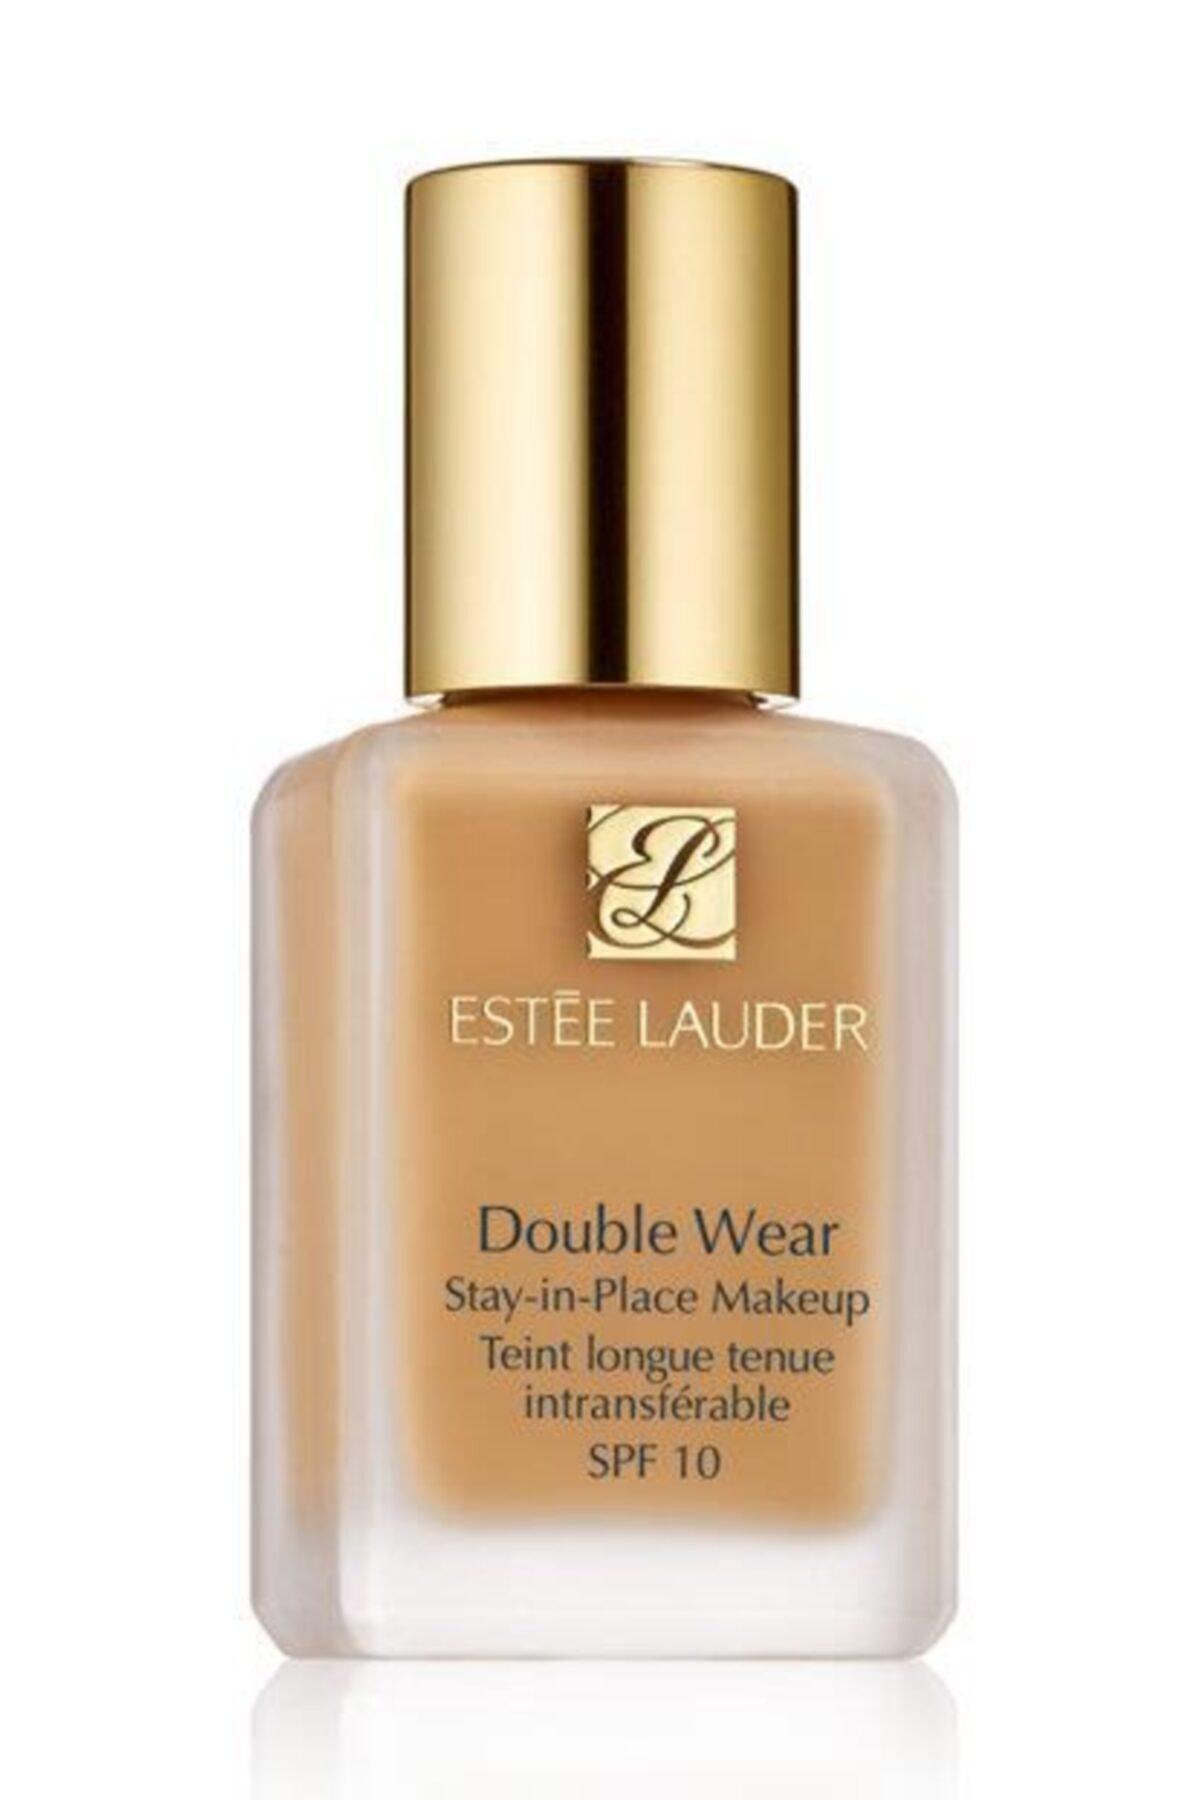 Estee Lauder Fondöten - Double Wear Foundation S.I.P Spf 10 2C1 Pure Beige 30 ml 027131934998 1